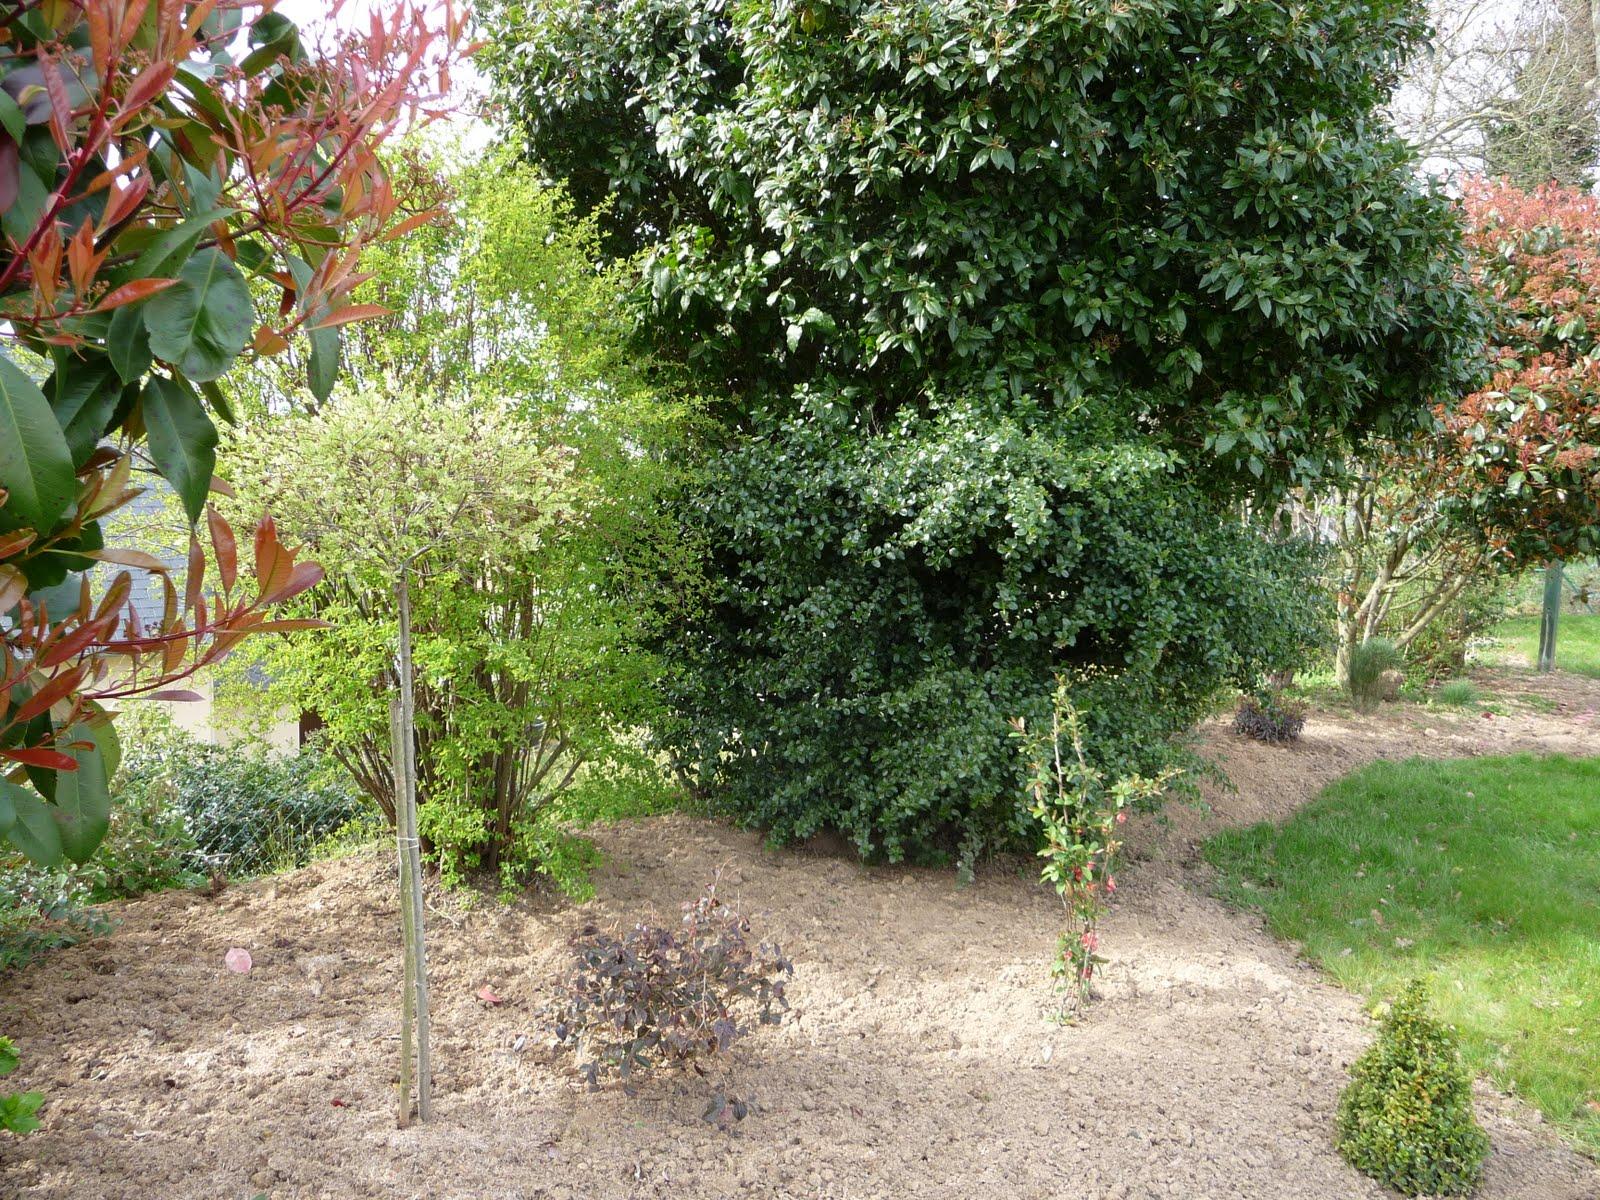 Ma terre de bruy re nettoyage de printemps for Nettoyage jardin printemps